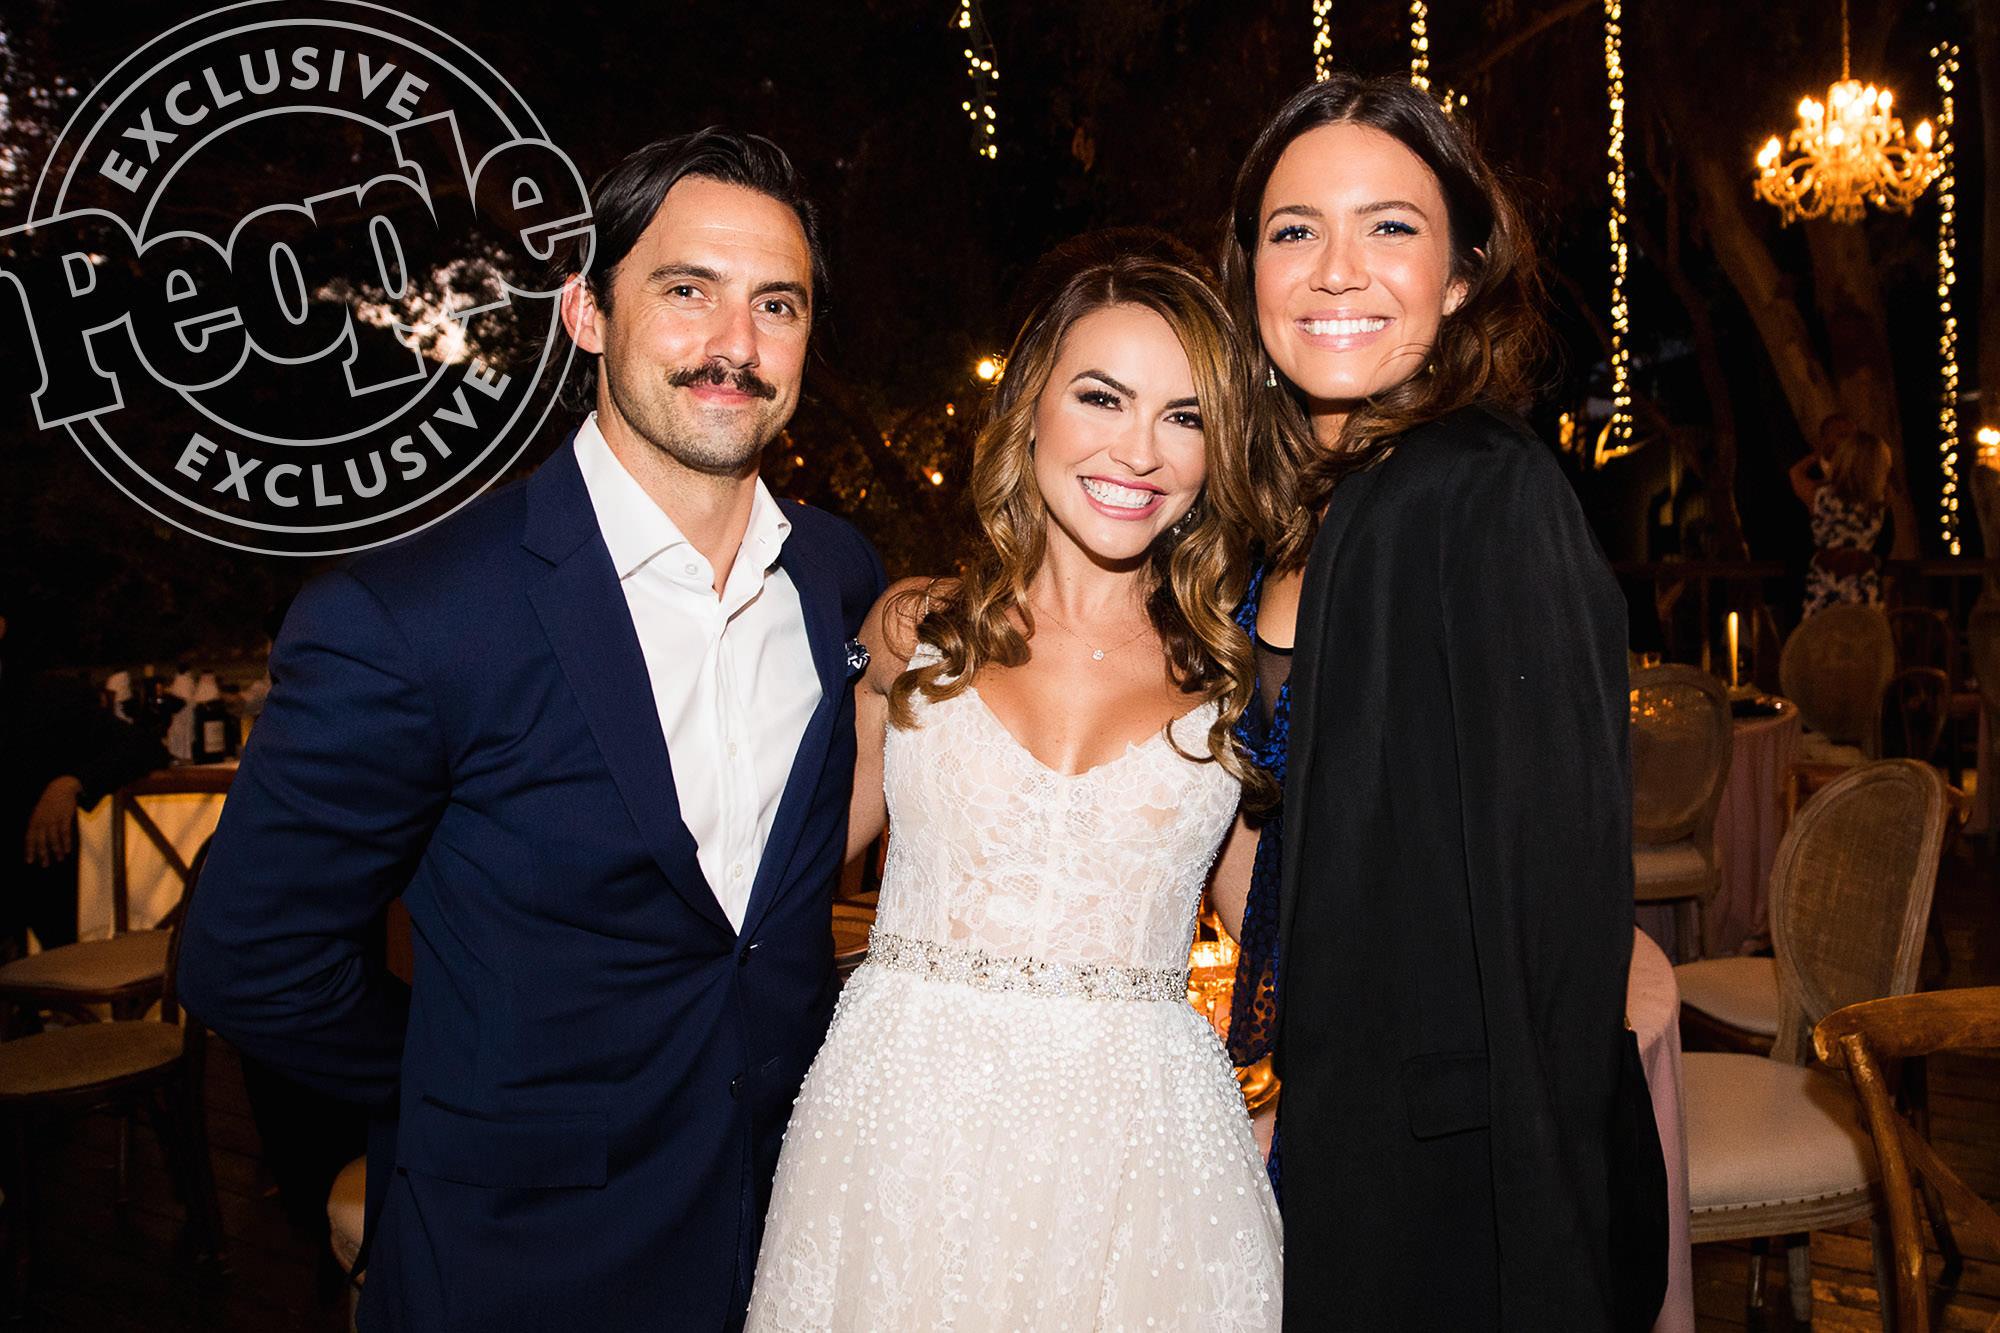 Justin Hartley wedding photo of Chrishell Stause, Milo Ventimiglia and  Mandy Moore